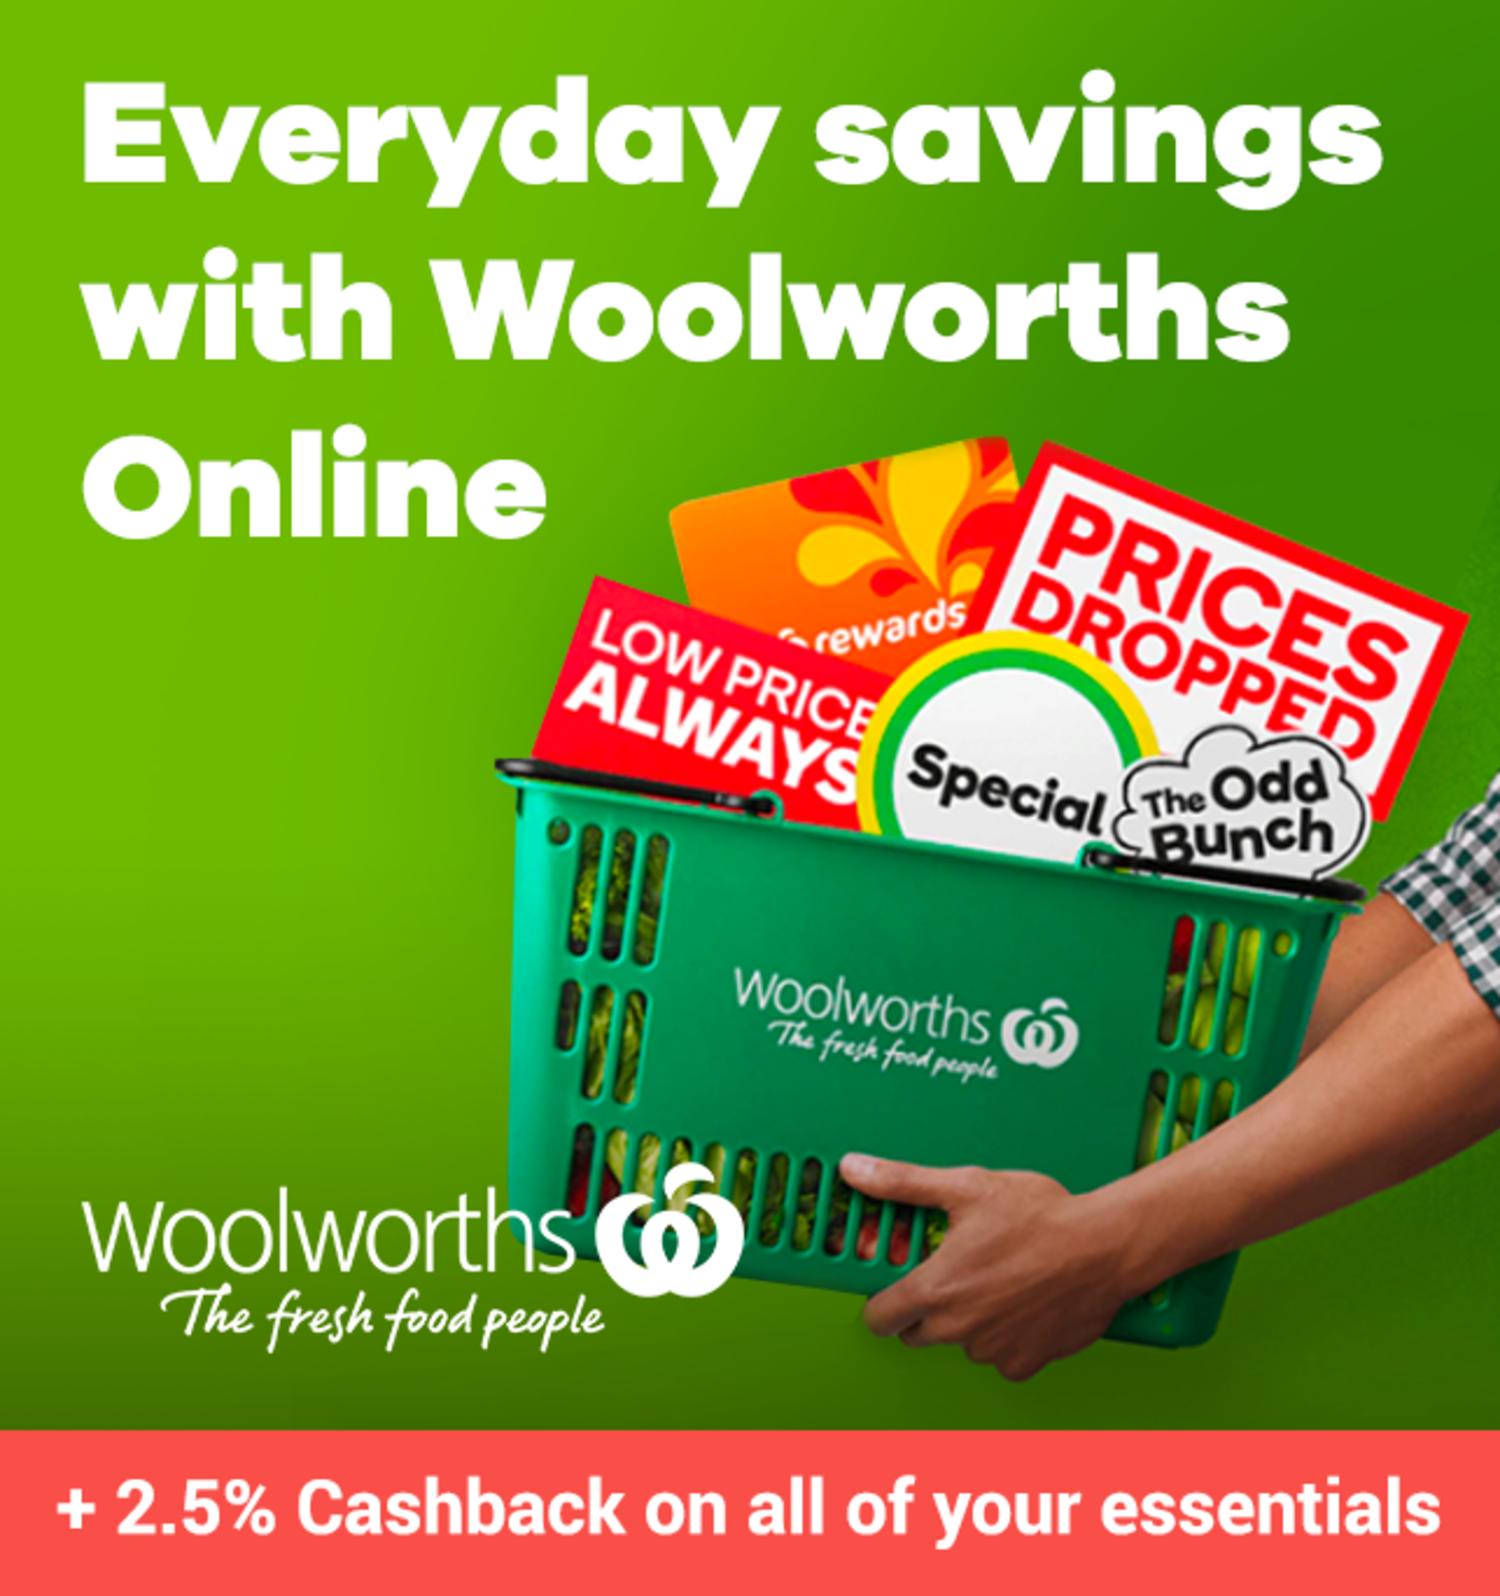 Woolworths - 2.5% Cashback